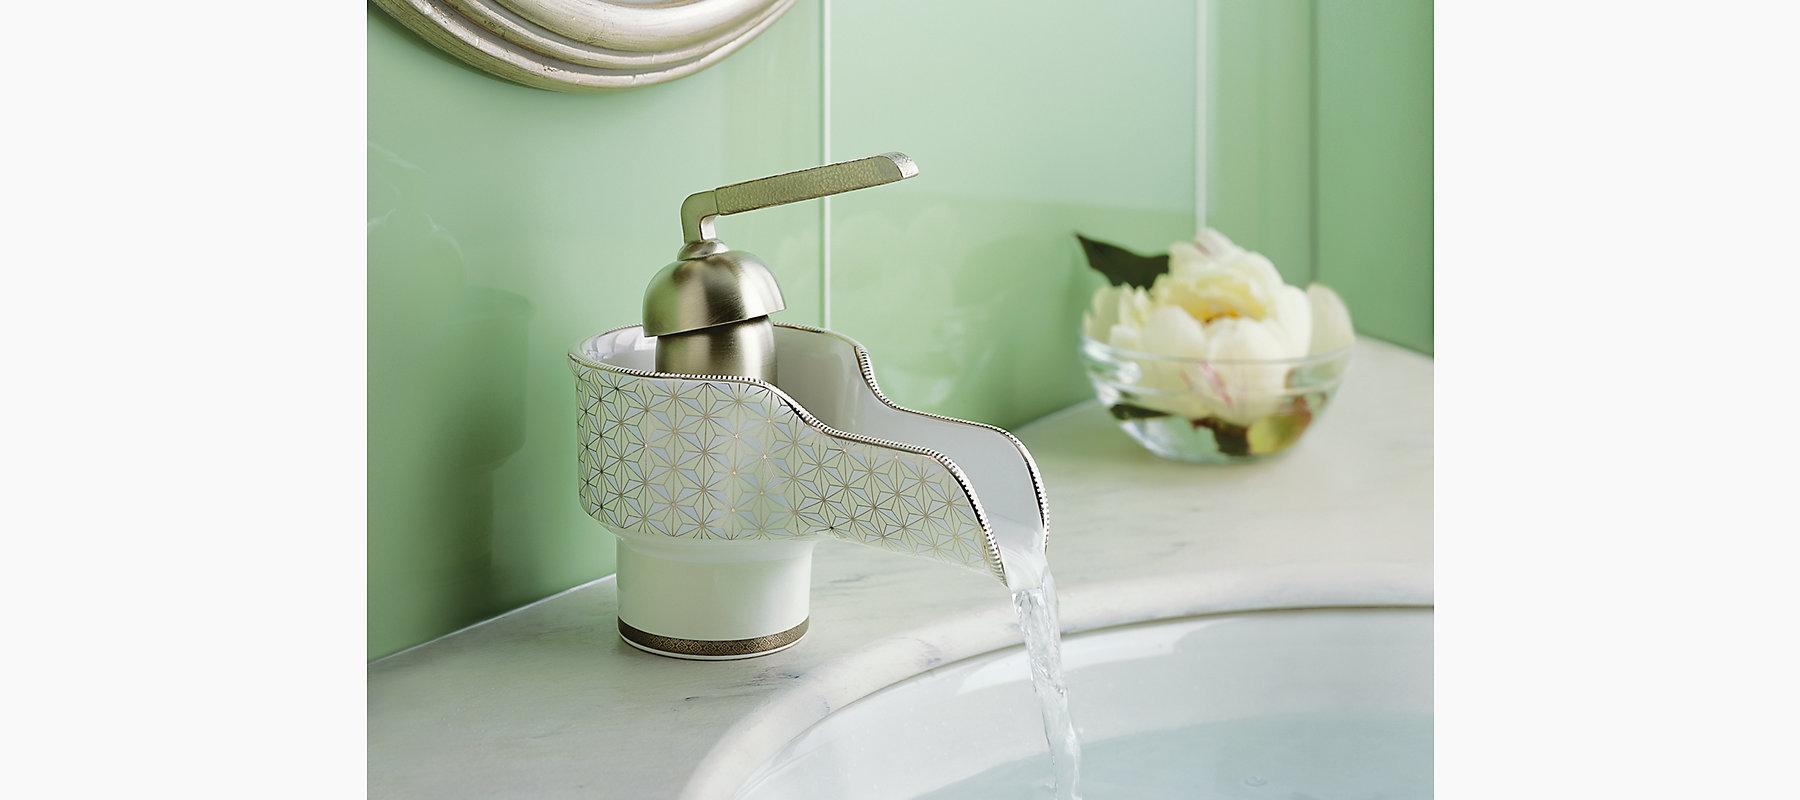 Silkweave Design On Bol Bathroom Sink Faucet With Lever Handle K - Discontinued kohler bathroom sink faucets